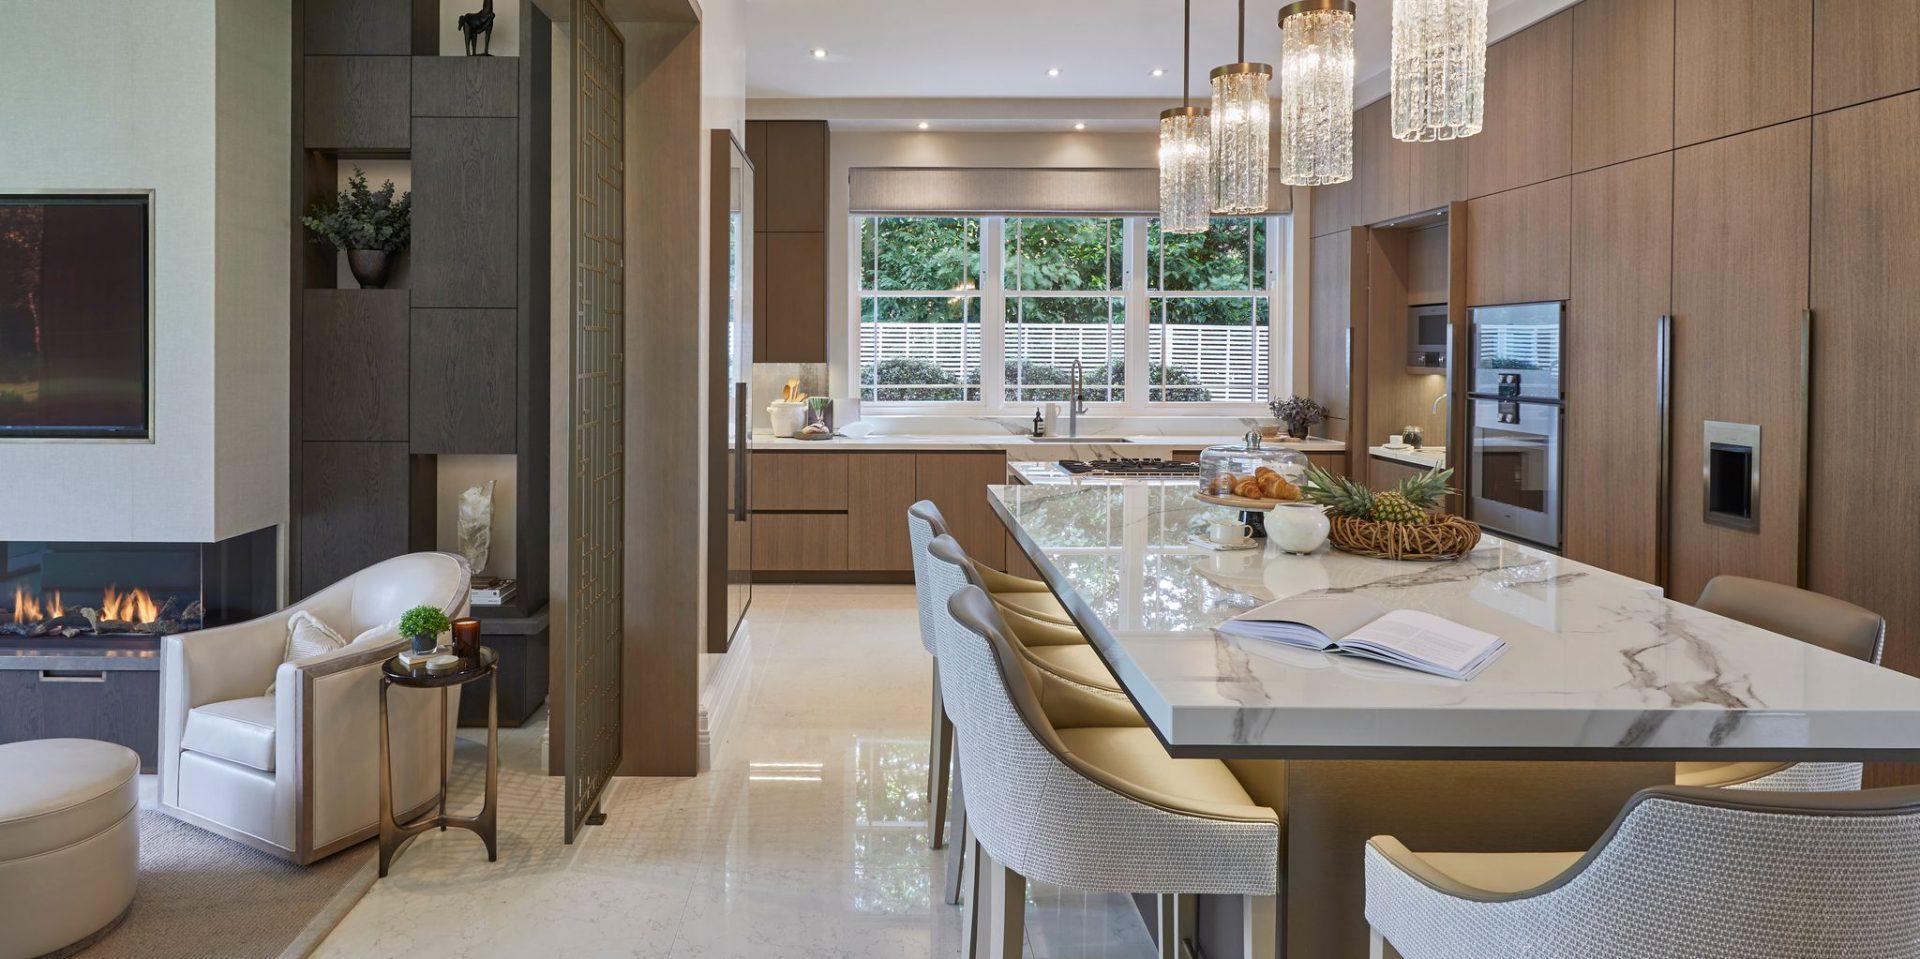 Luxury Elegant Kitchen